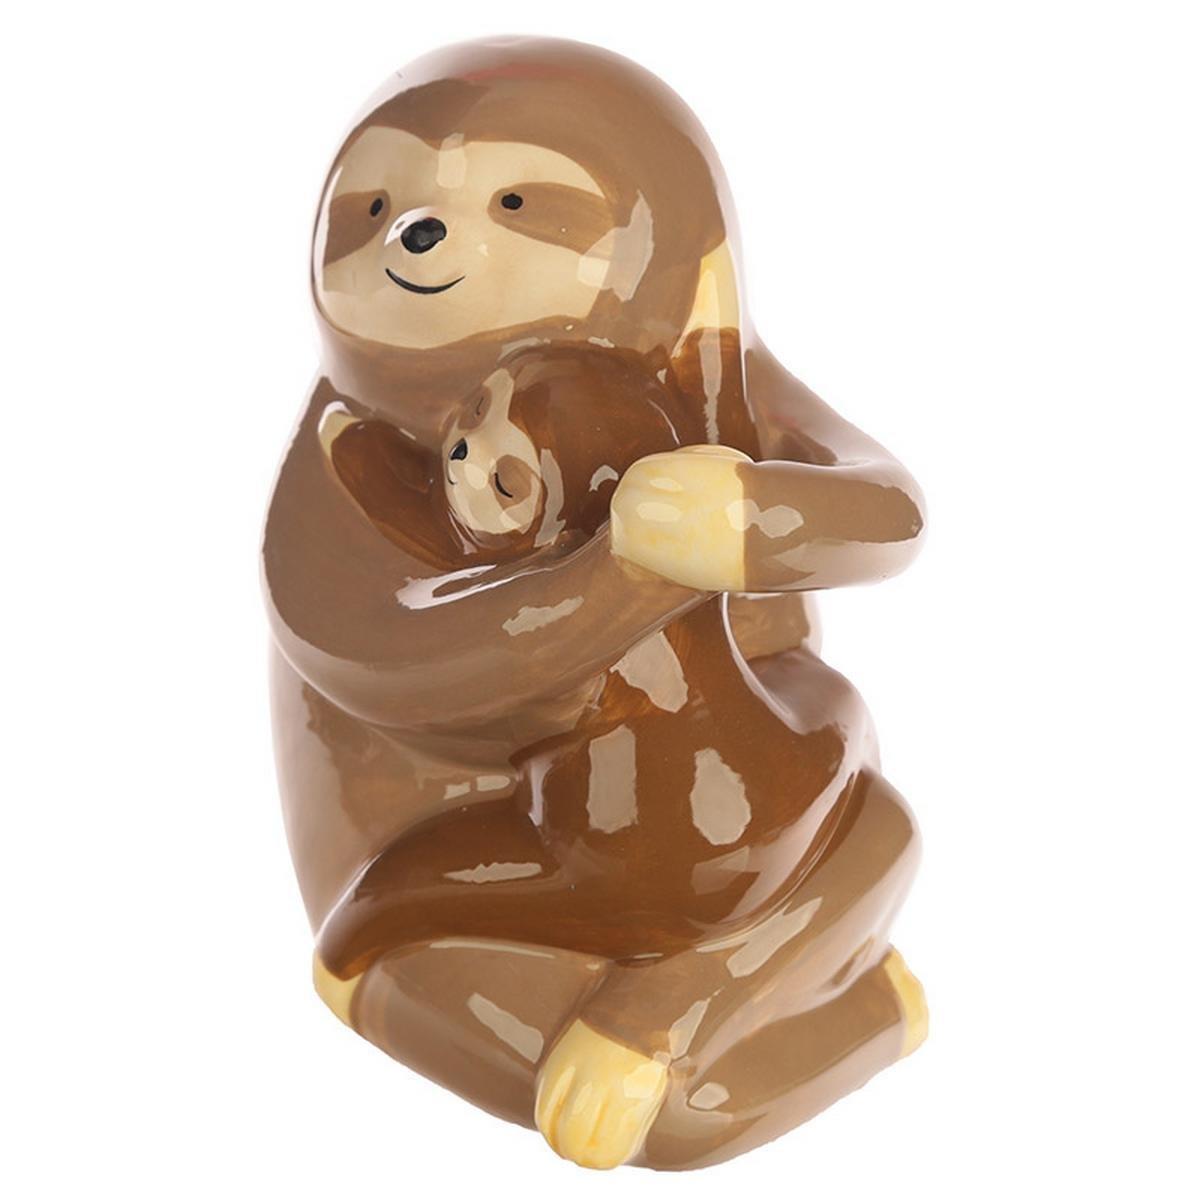 Puckator Ceramic Sloth and Baby Money Box